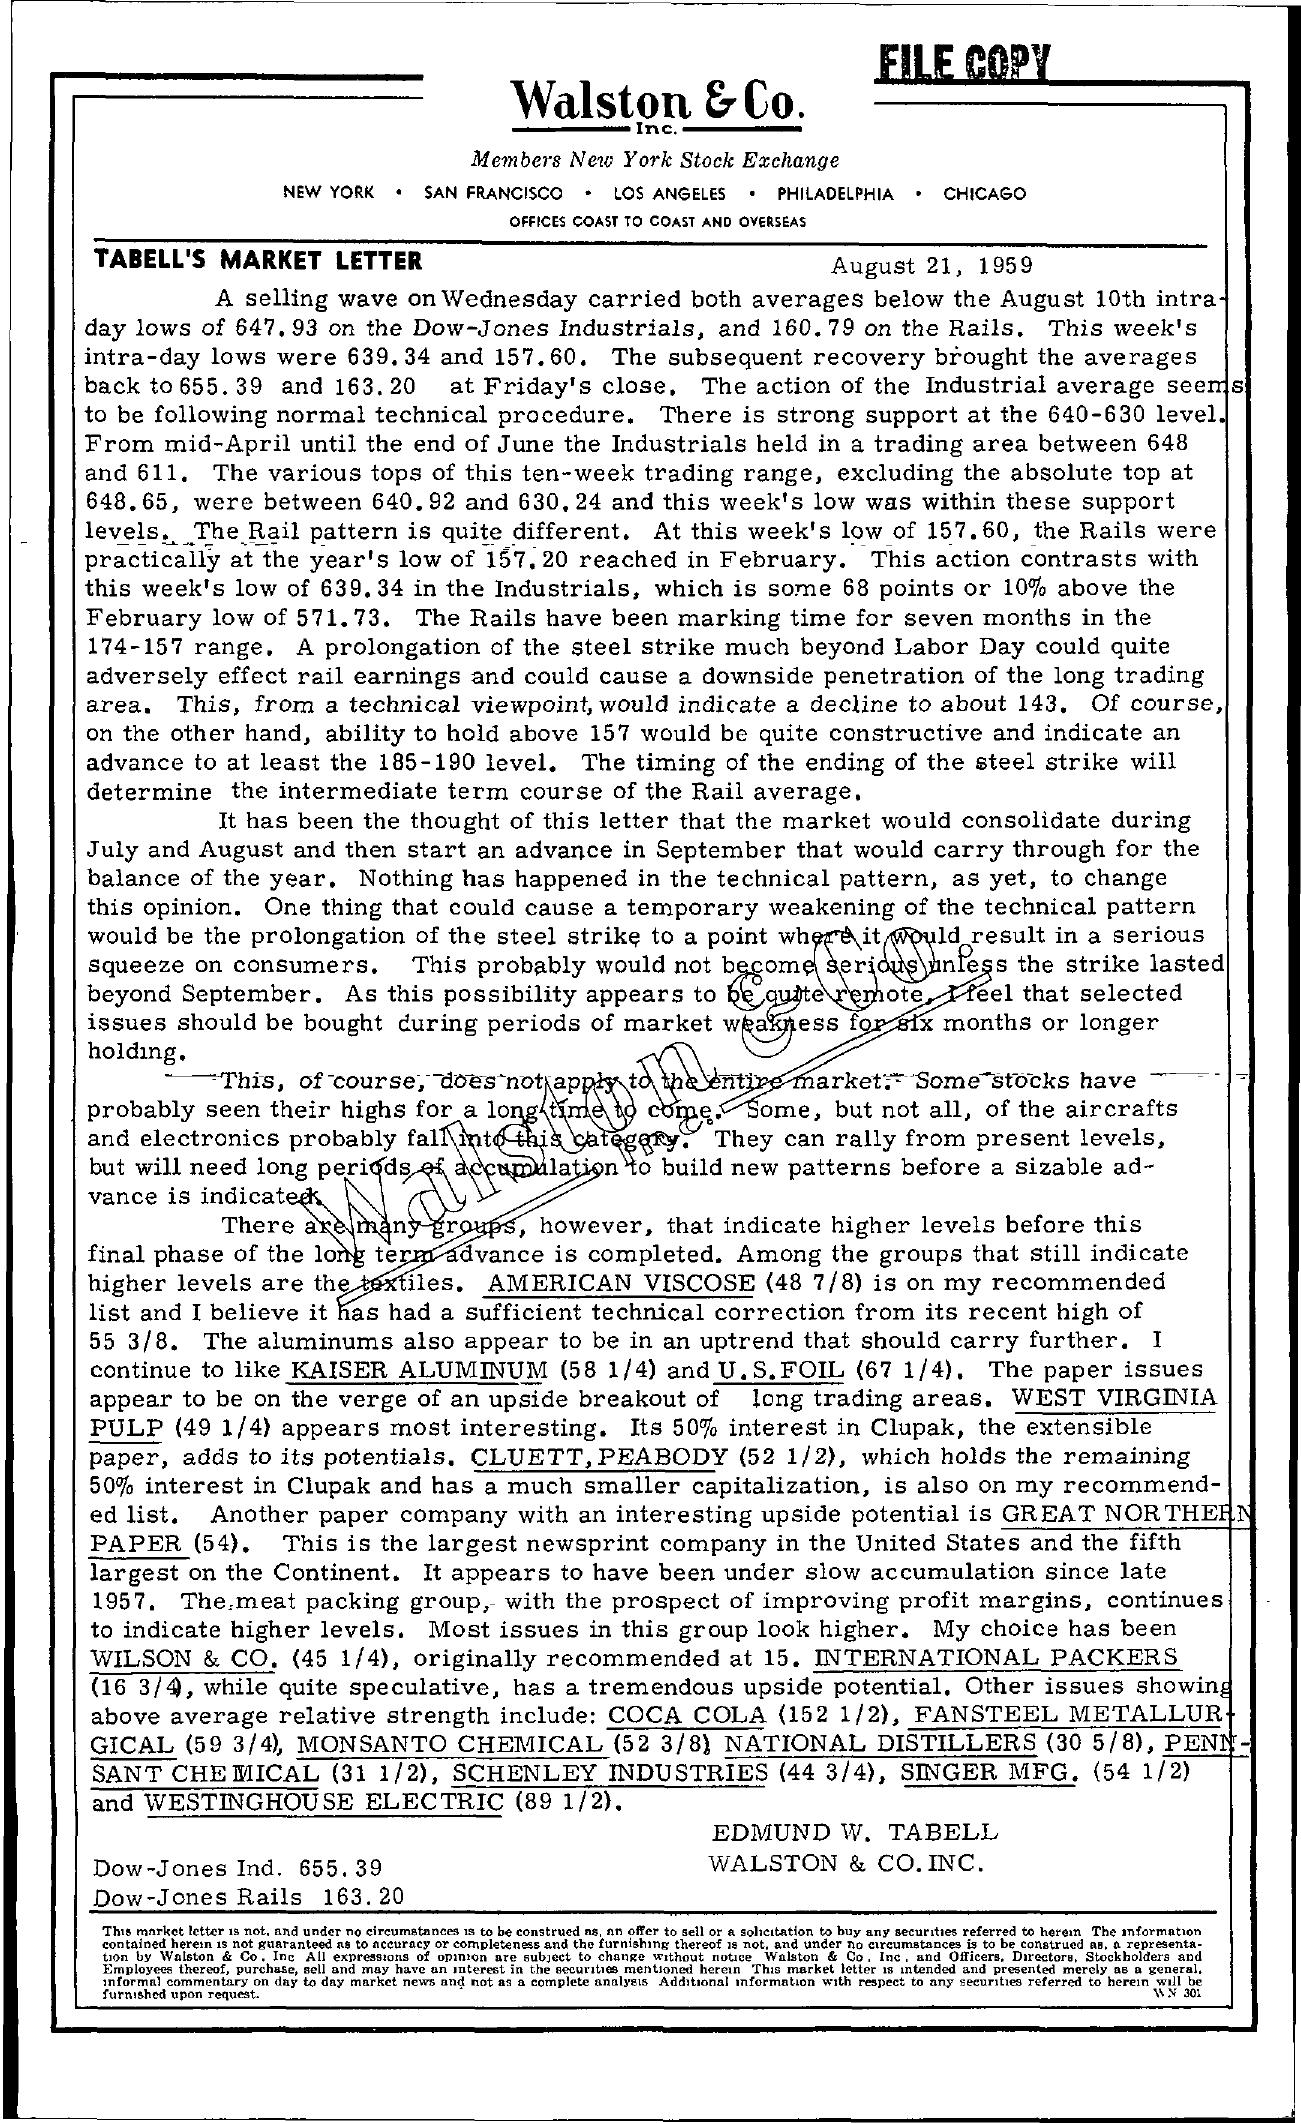 Tabell's Market Letter - August 21, 1959